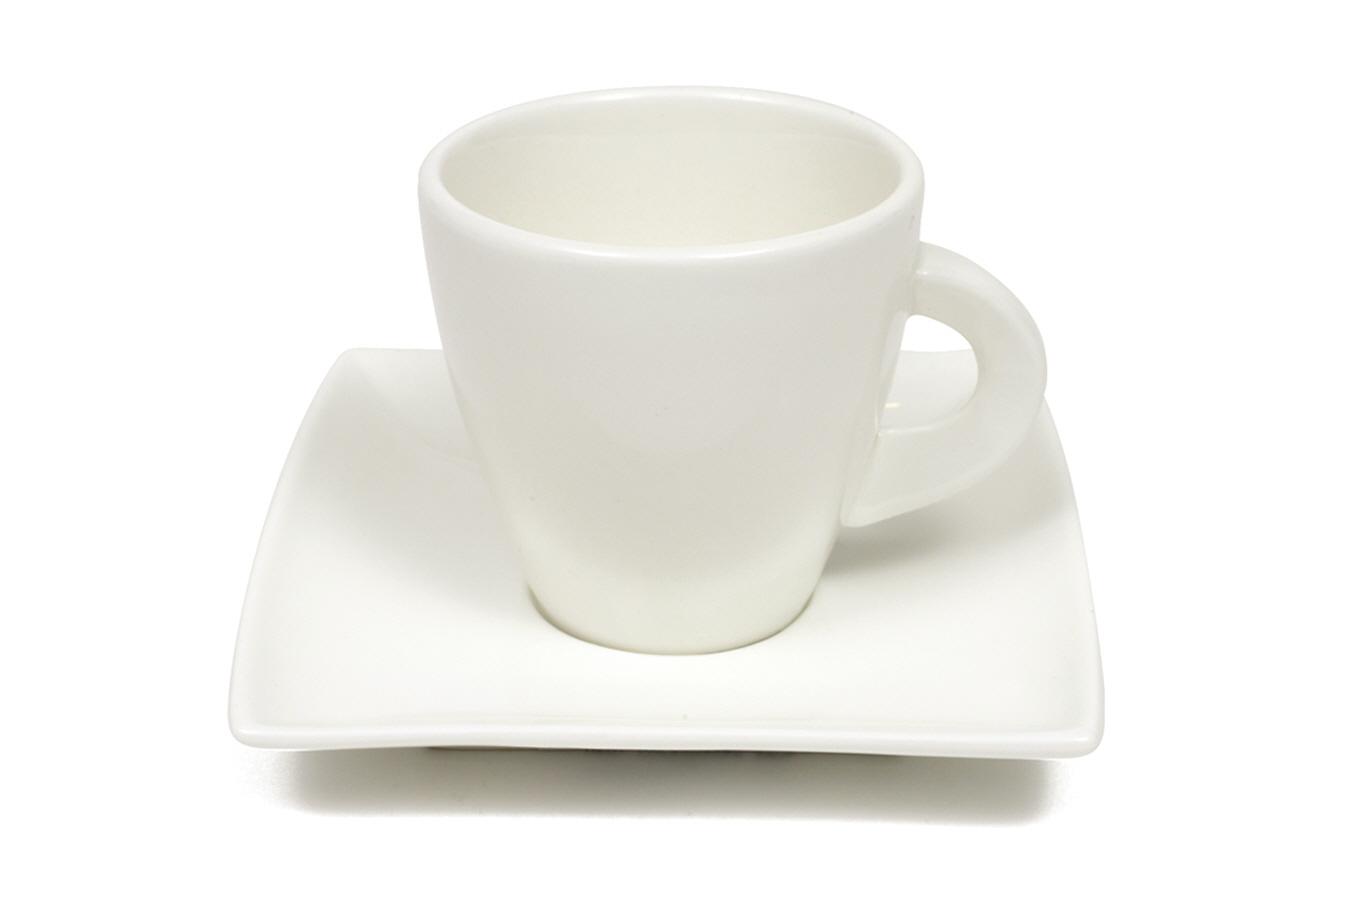 Šálek s podšálkem na cappuccino East Meets West 200 ml - Maxwell&Willi